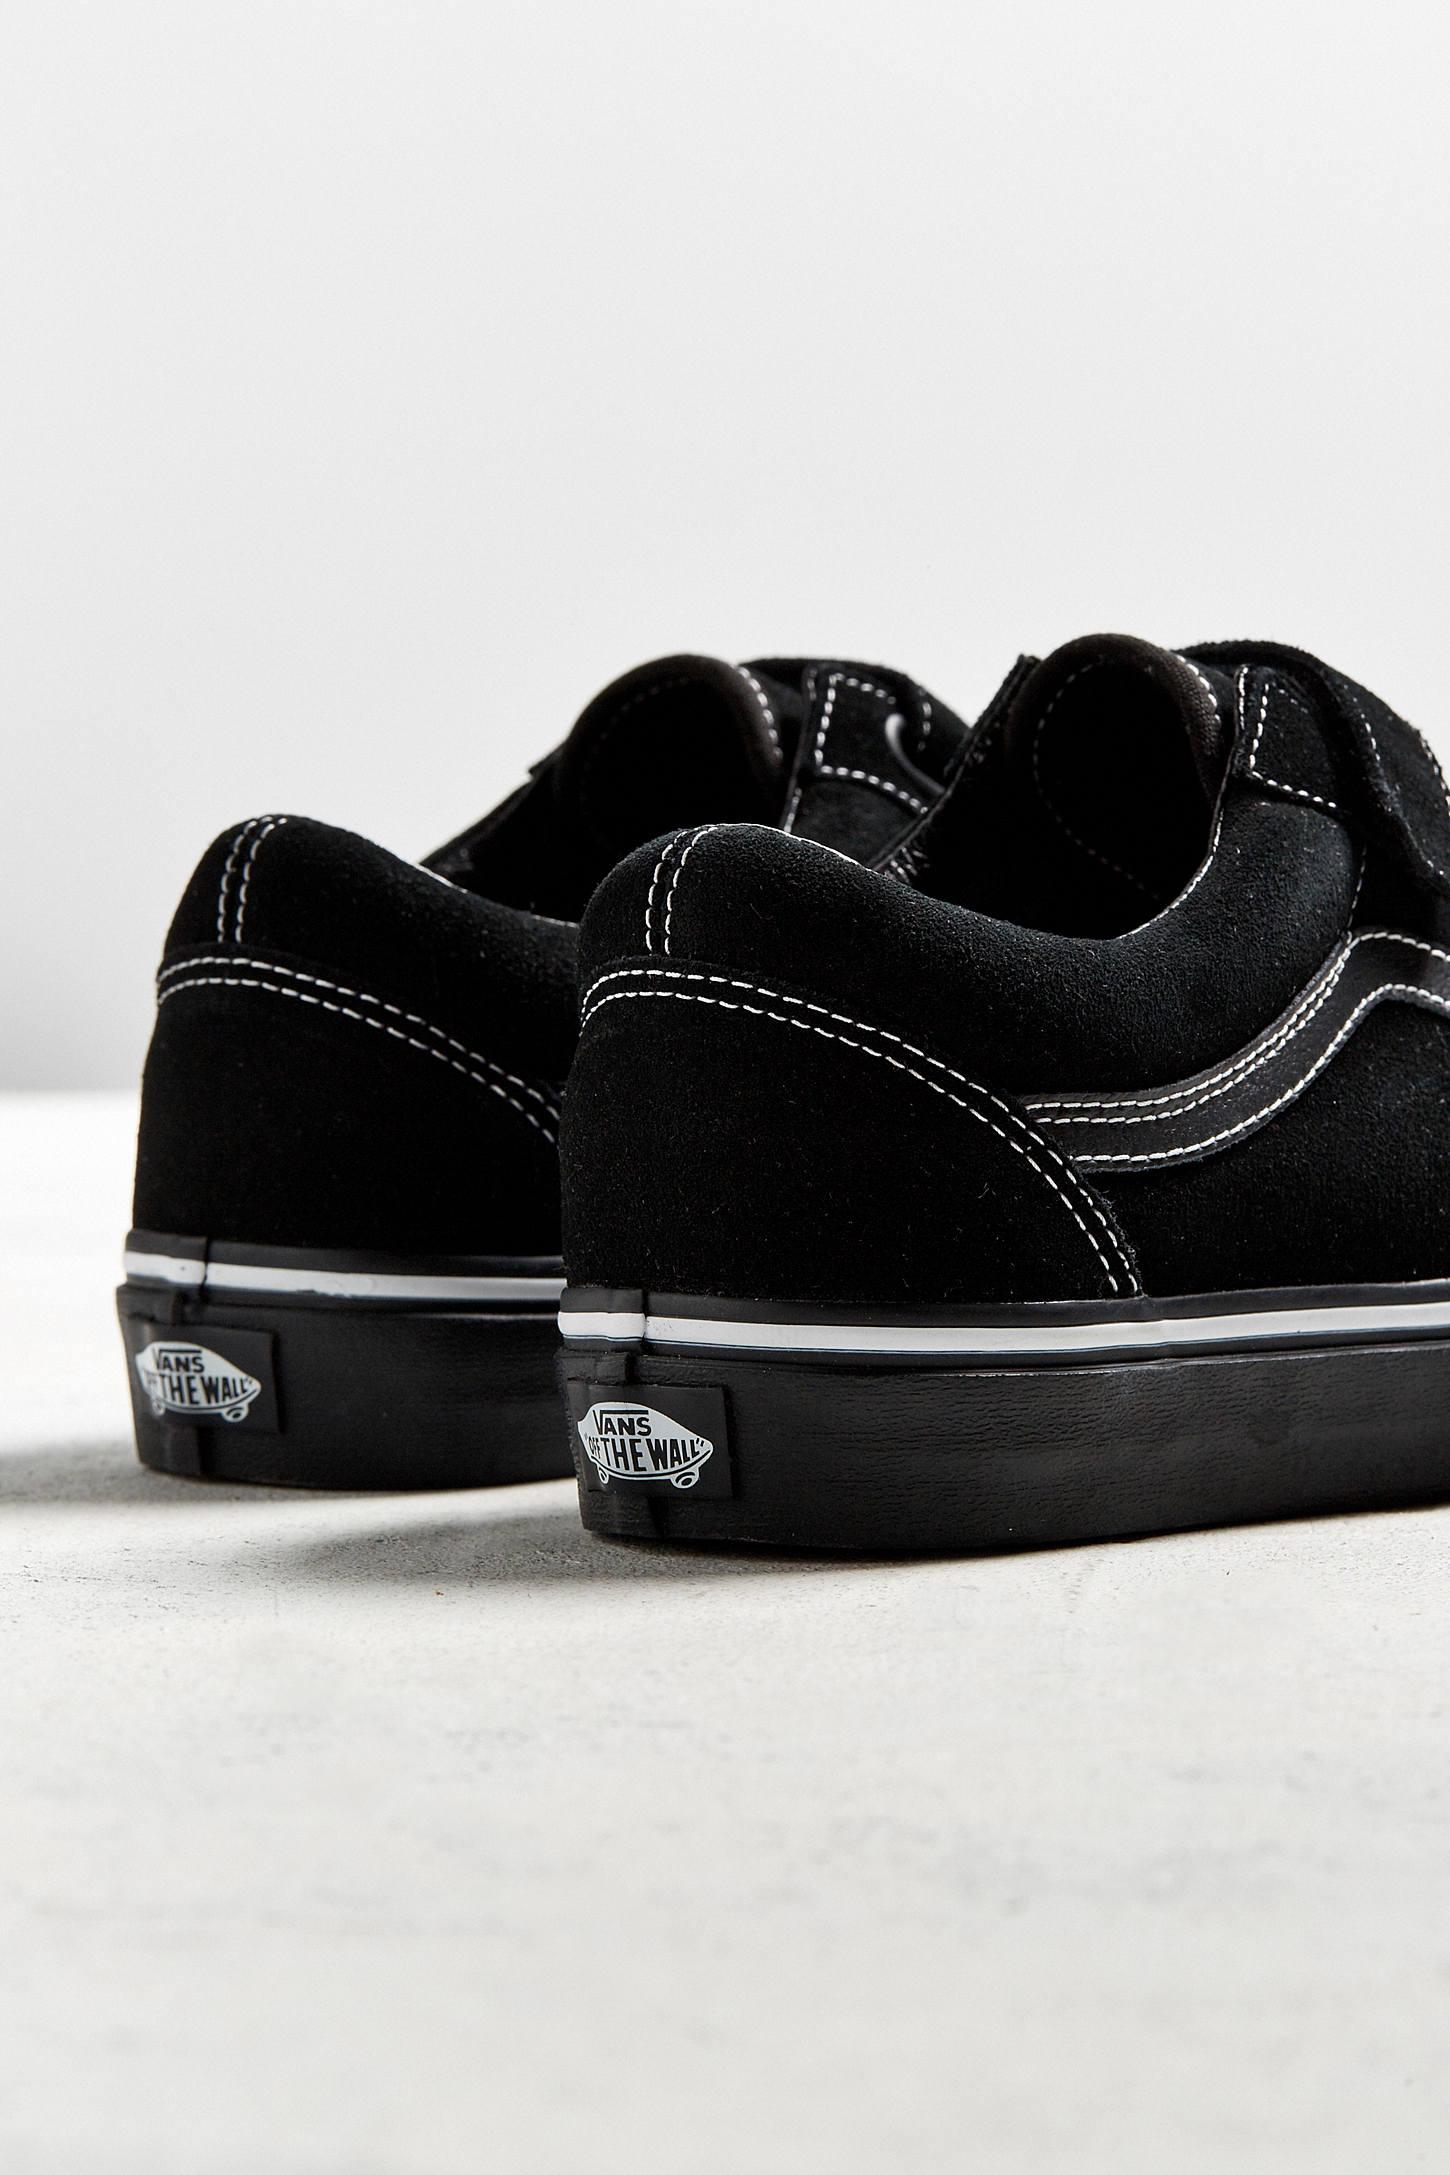 Skate shoes edmonton - Slide View 6 Vans X Uo Old Skool V Sneaker